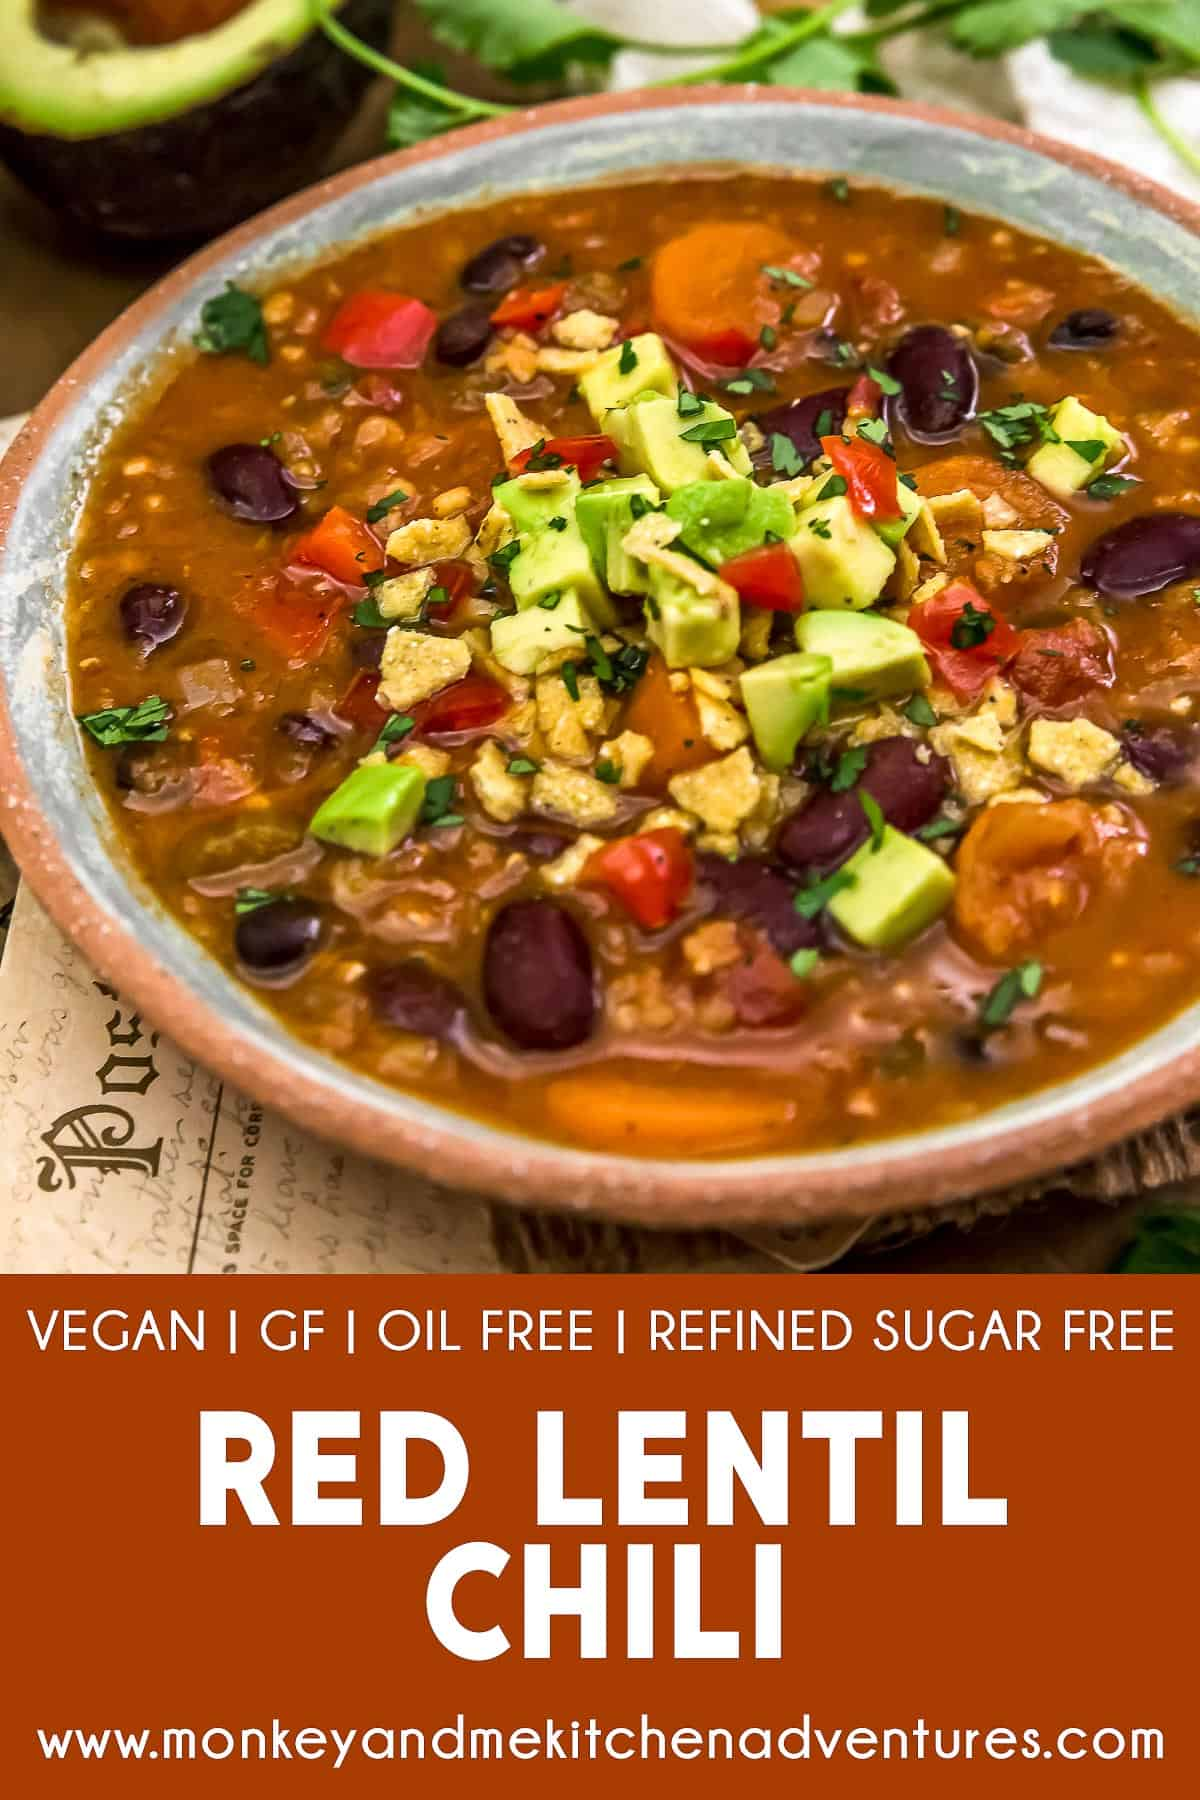 Red Lentil Chili with text description